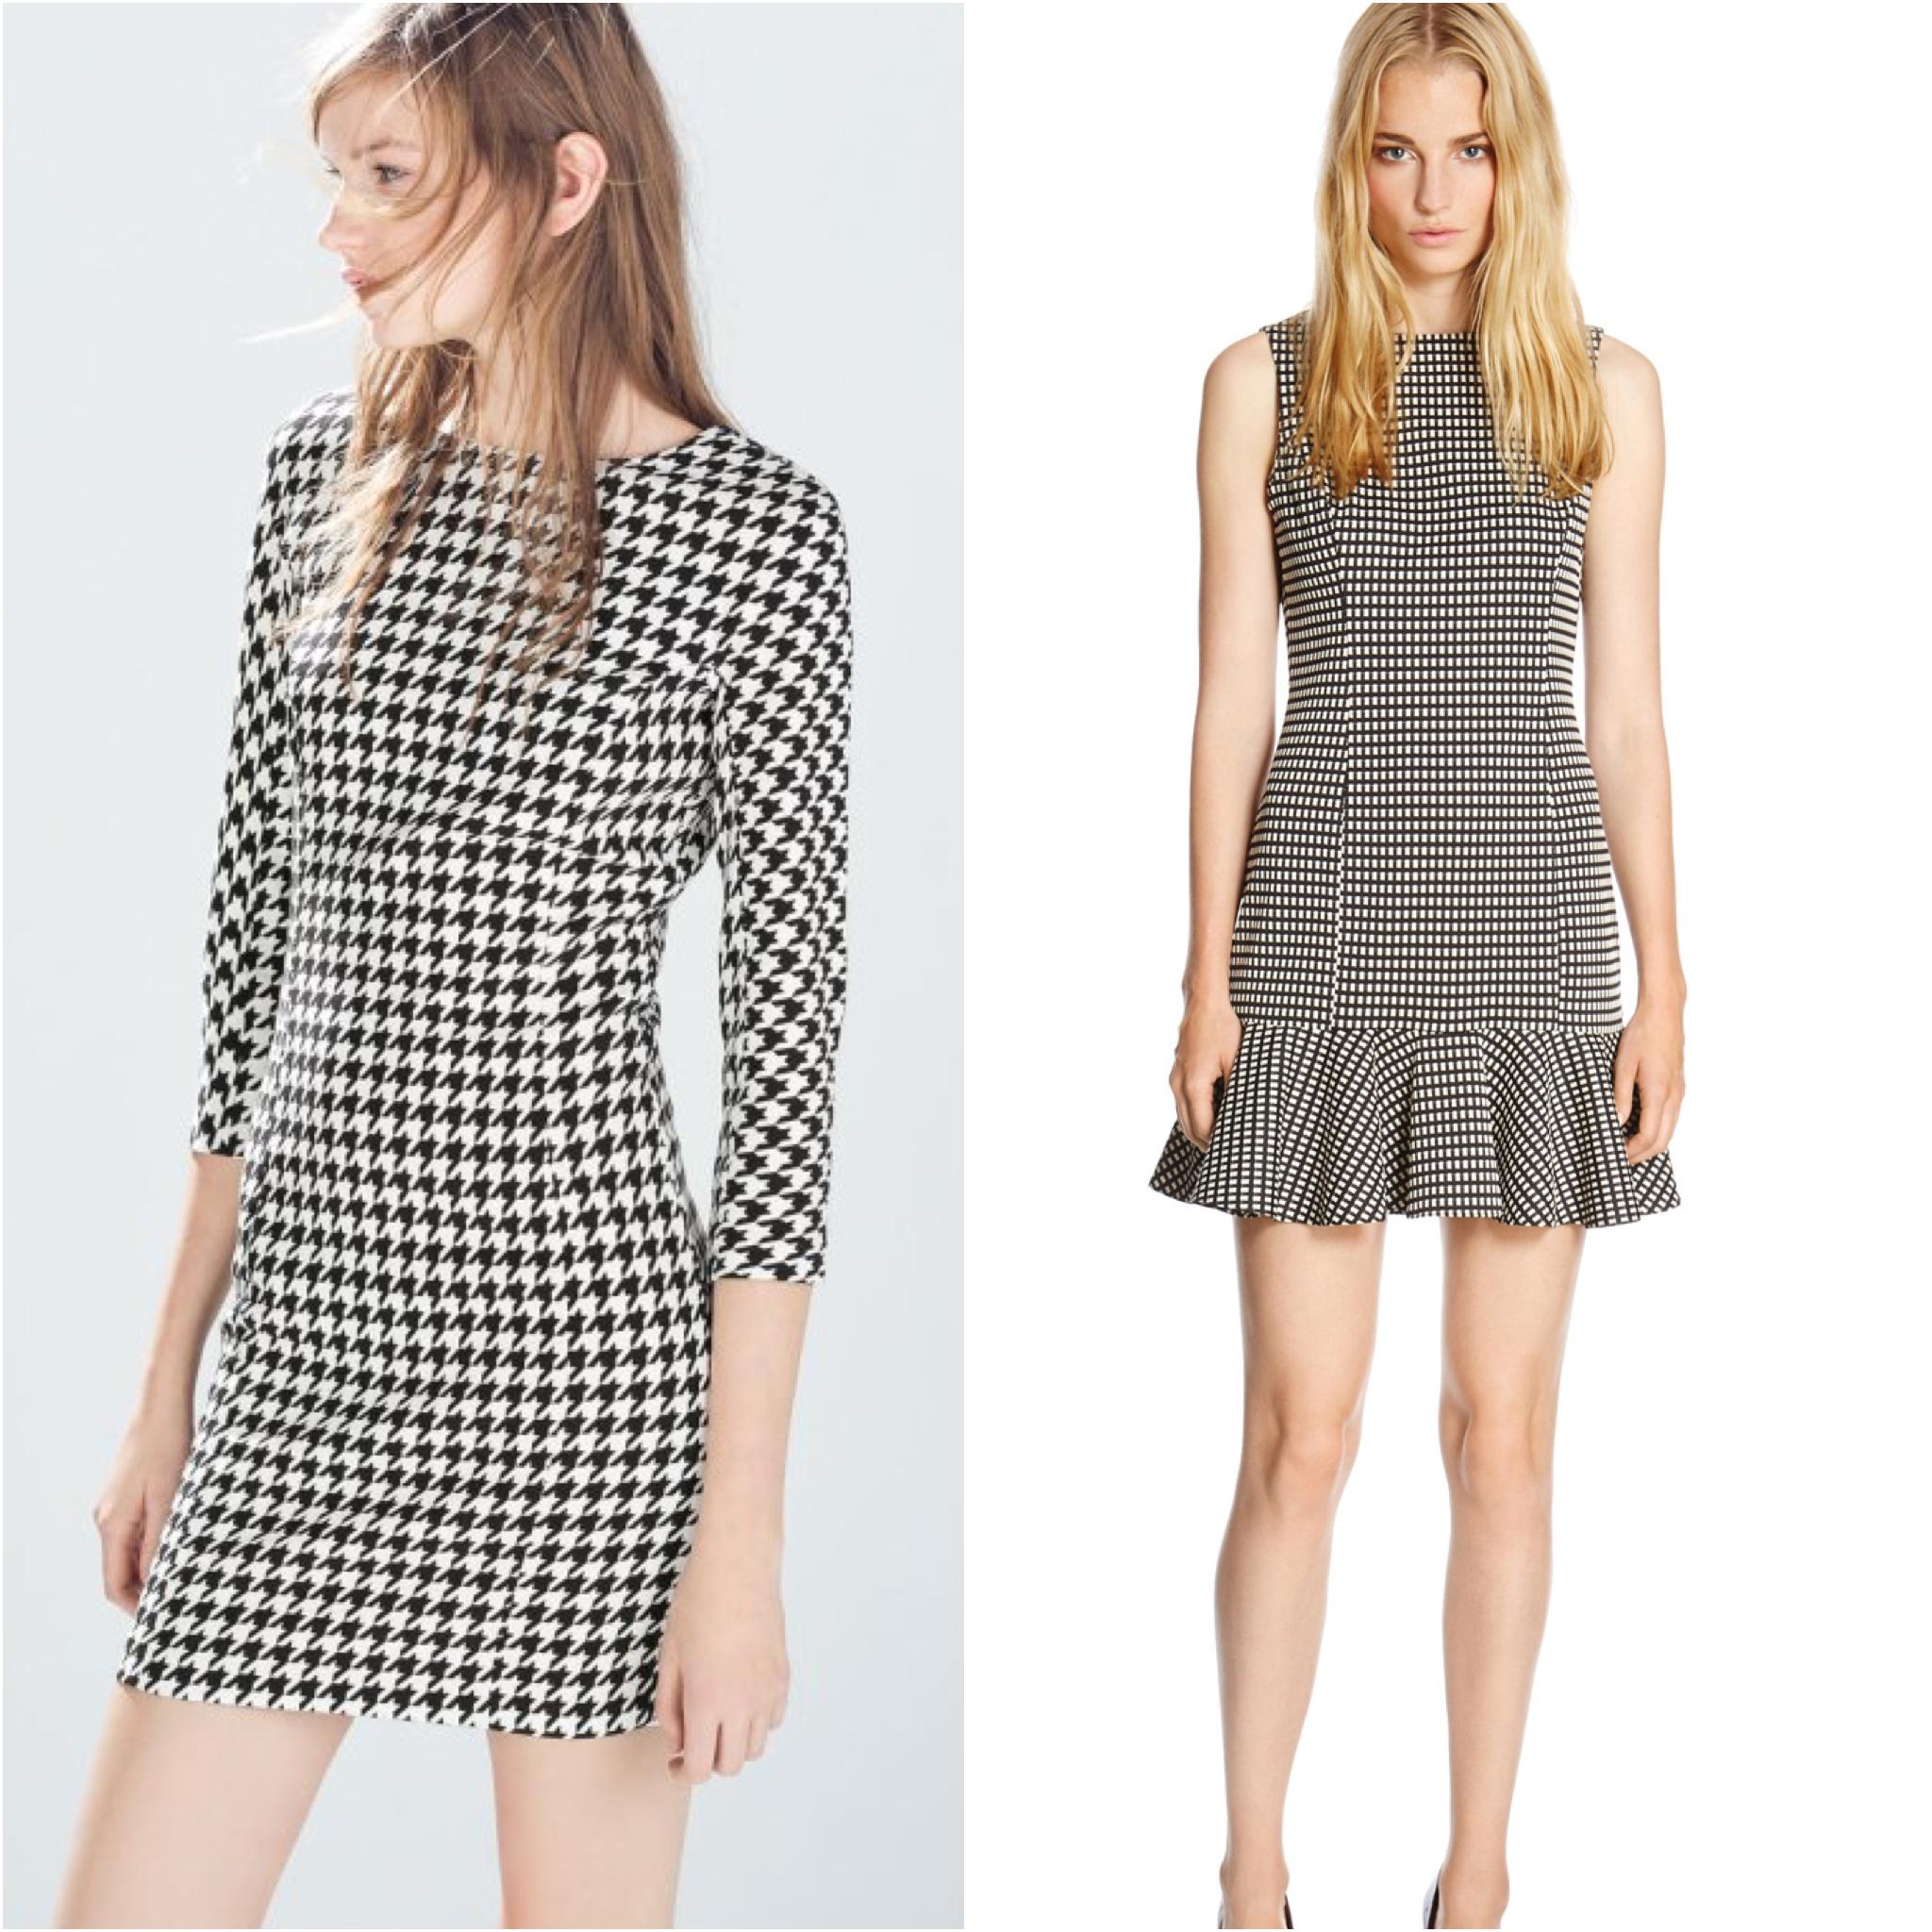 Zara Houndstooth Dress and Warehouse Mini Gingham Dress